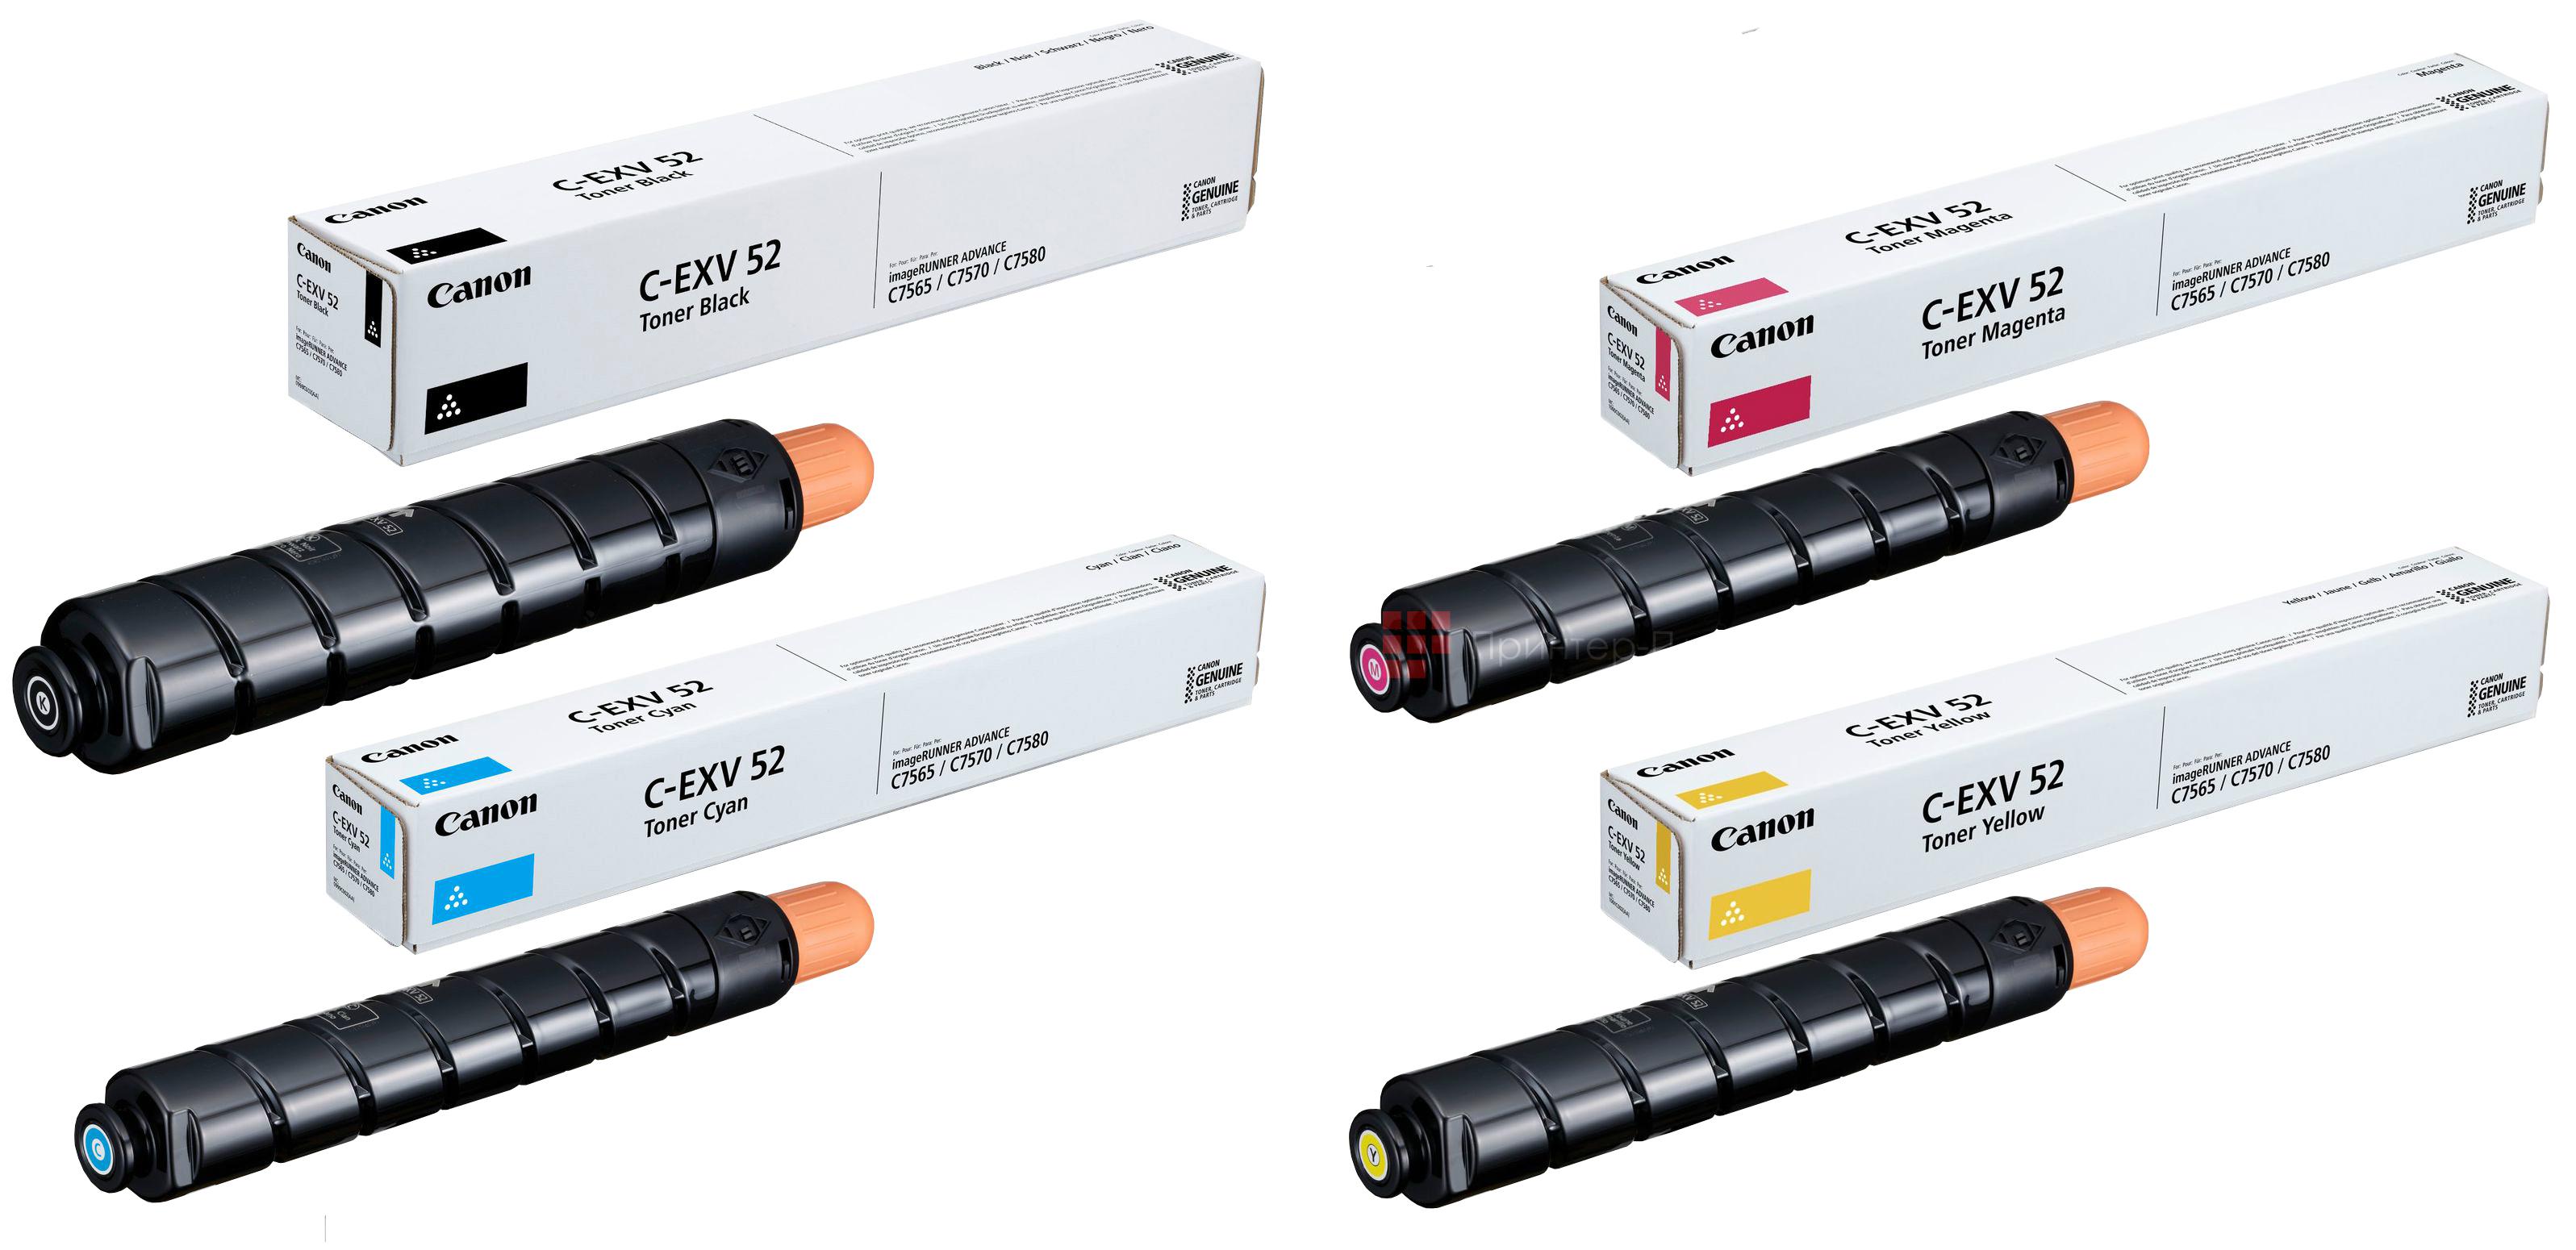 Canon imageRUNNER ADVANCE DX C7765i. Тонер C-EXV52